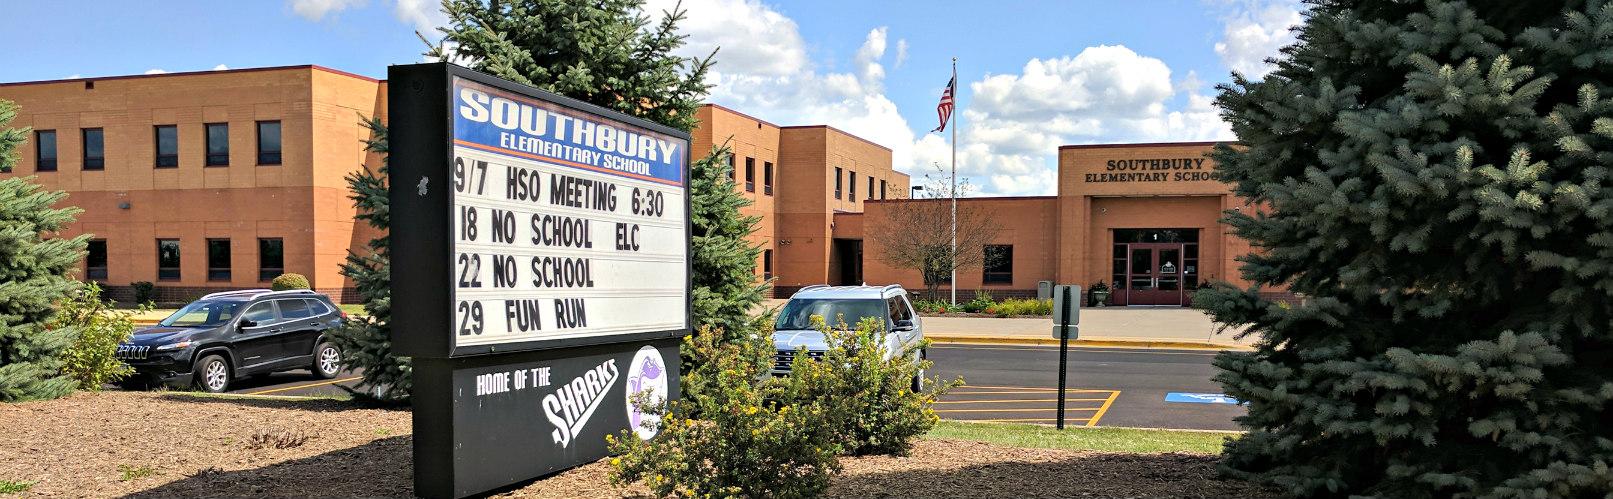 Southbury Elementary School